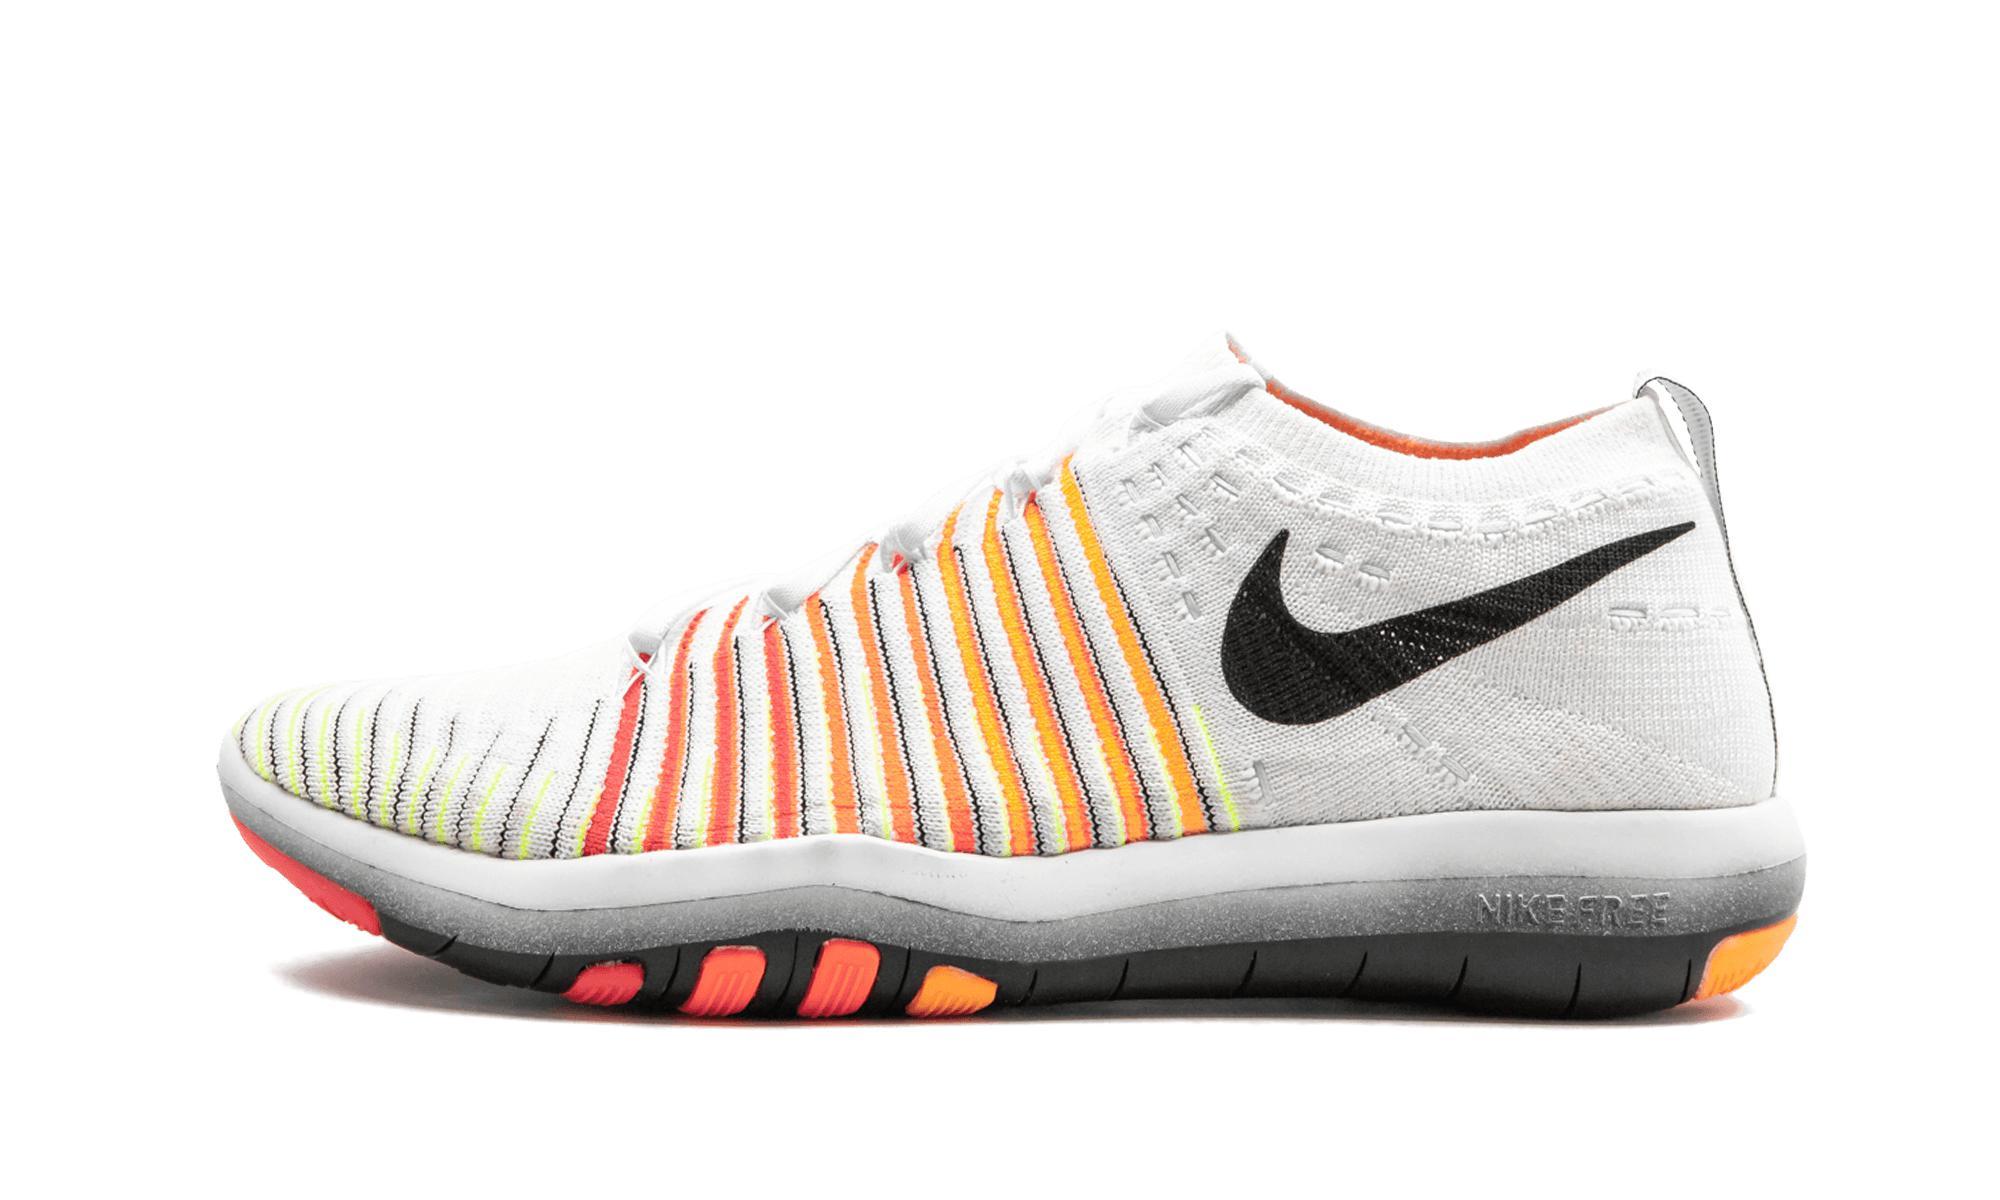 designer fashion 00cd0 4ed84 Nike. Mens W Freetransform Flyknit